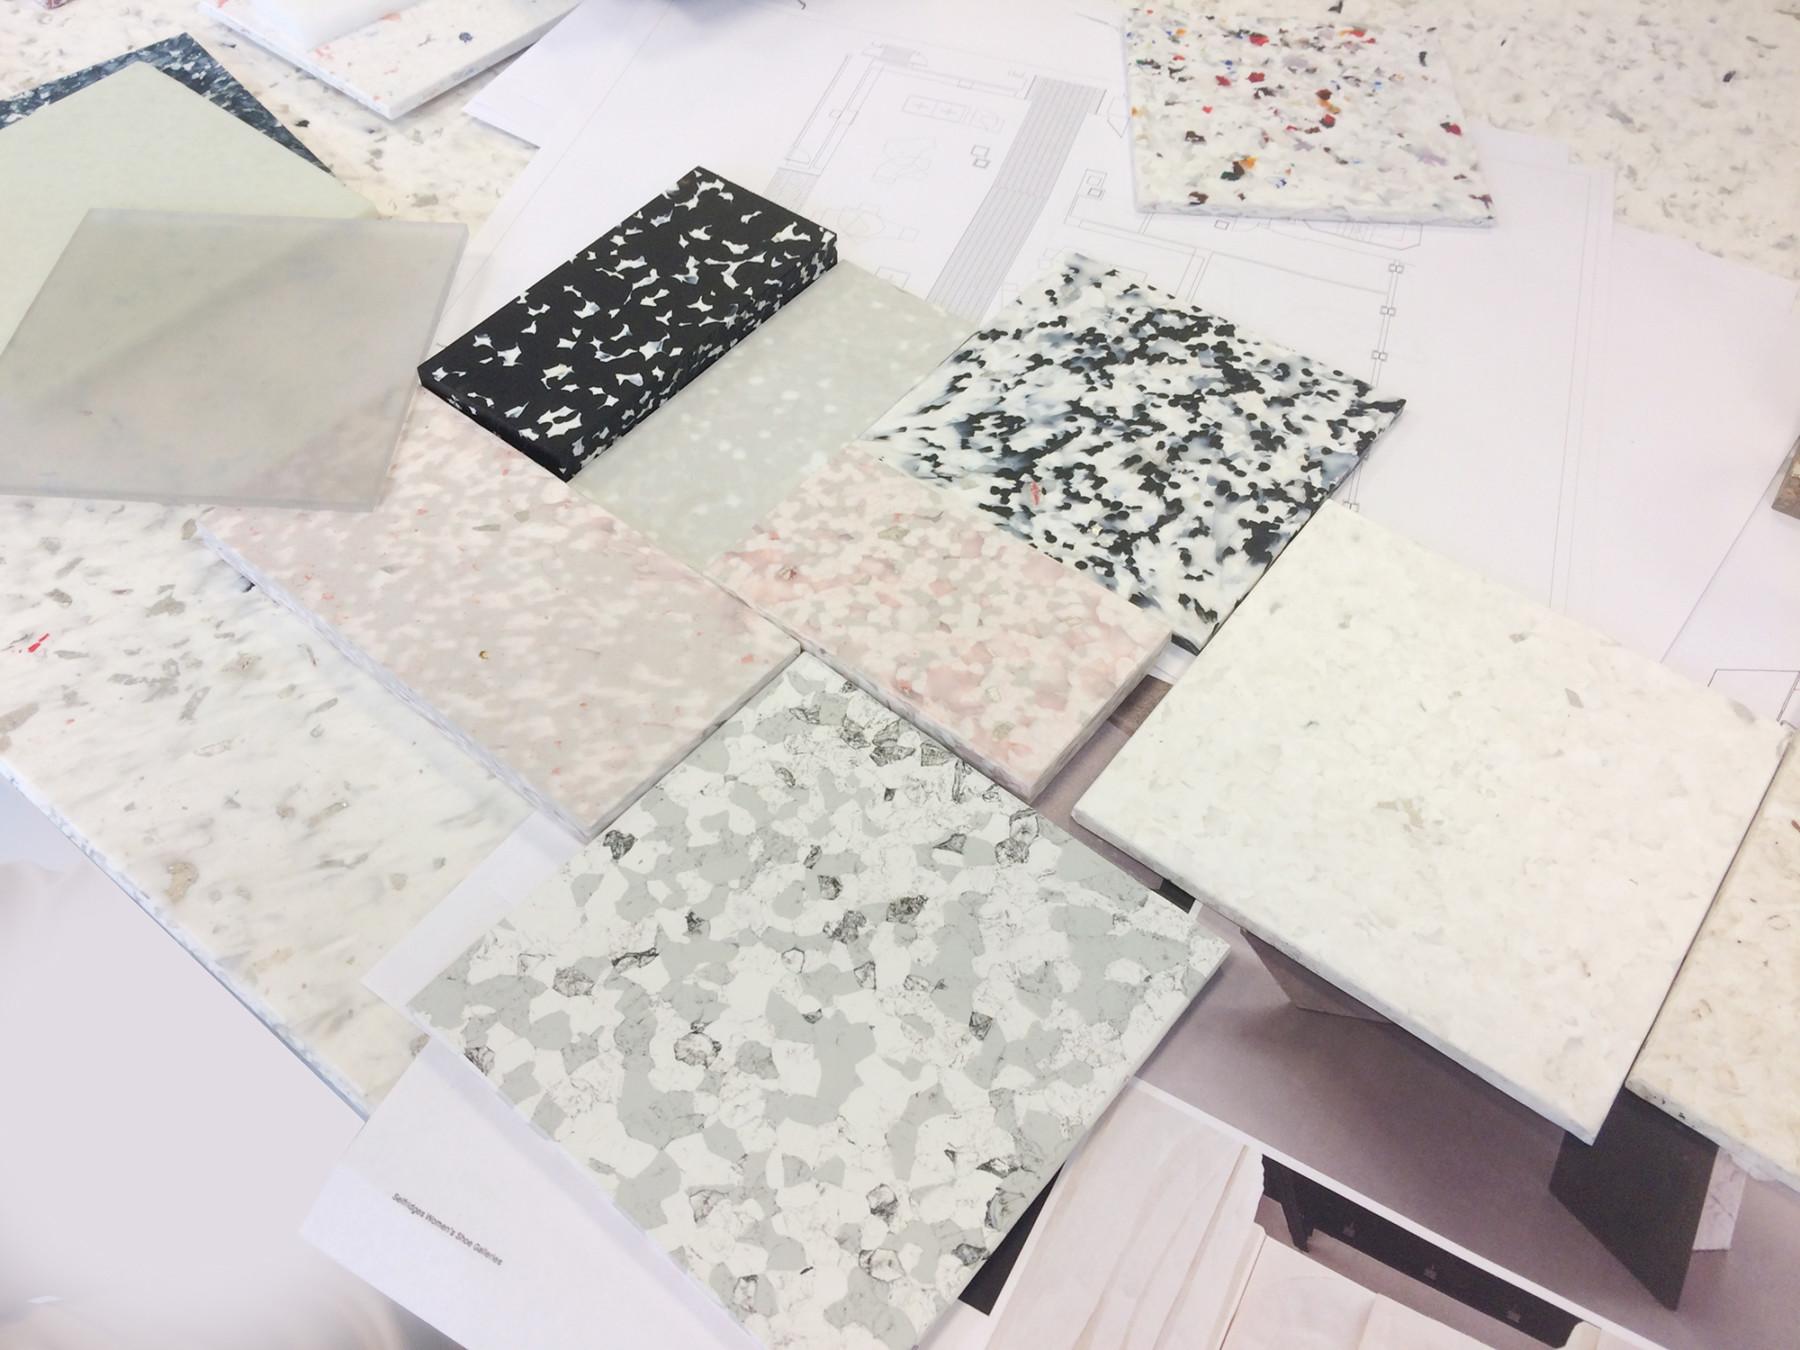 jamie-fobert-architects-selfridges-shoe-galleries-luxury-retail-concept-gallery-2-material1